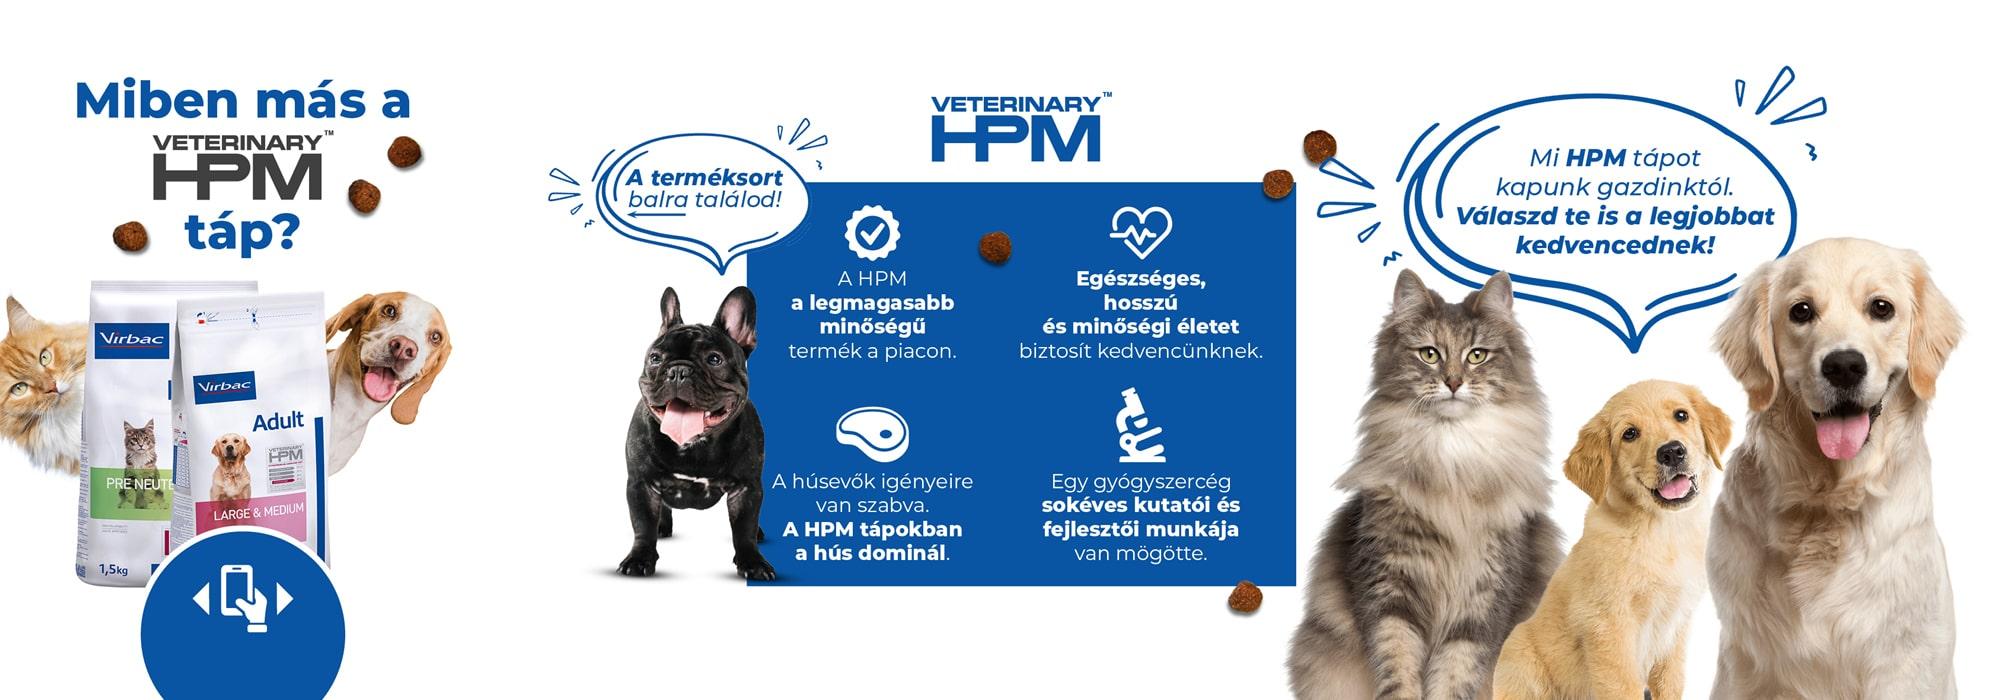 Veterinary HPM 3D poszt